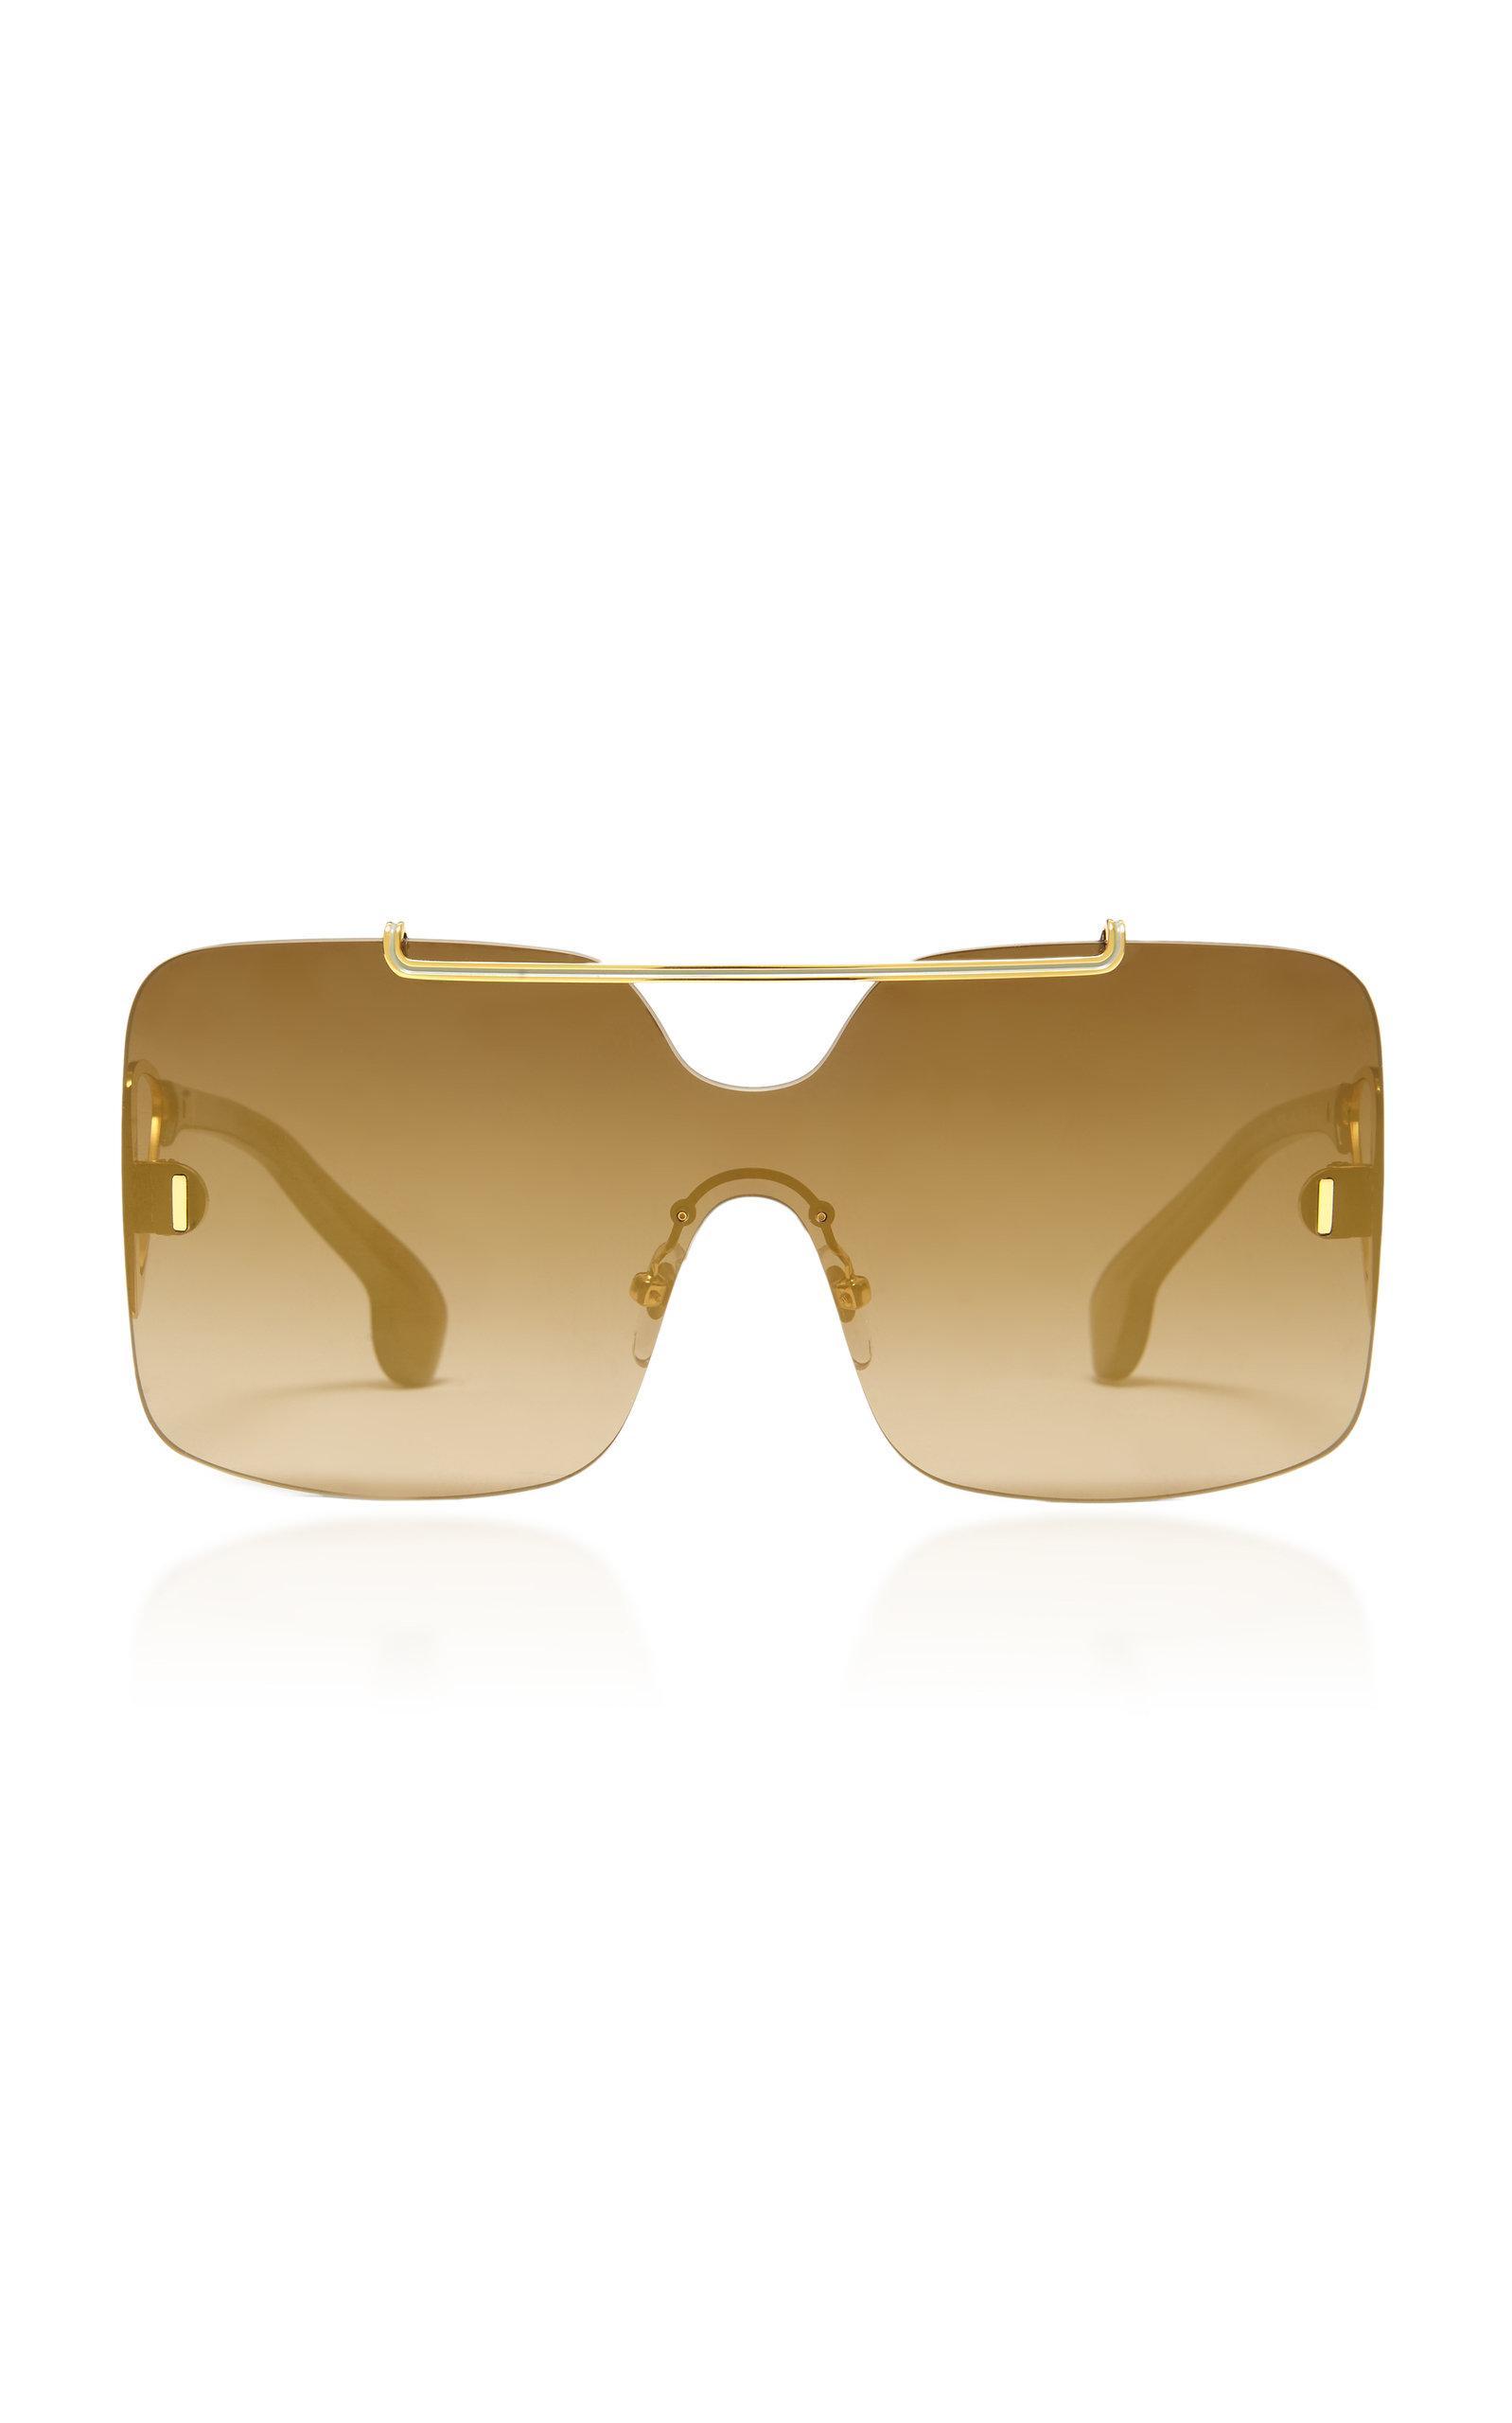 Philippe Chevallier Box Rimless Sunglasses In Brown